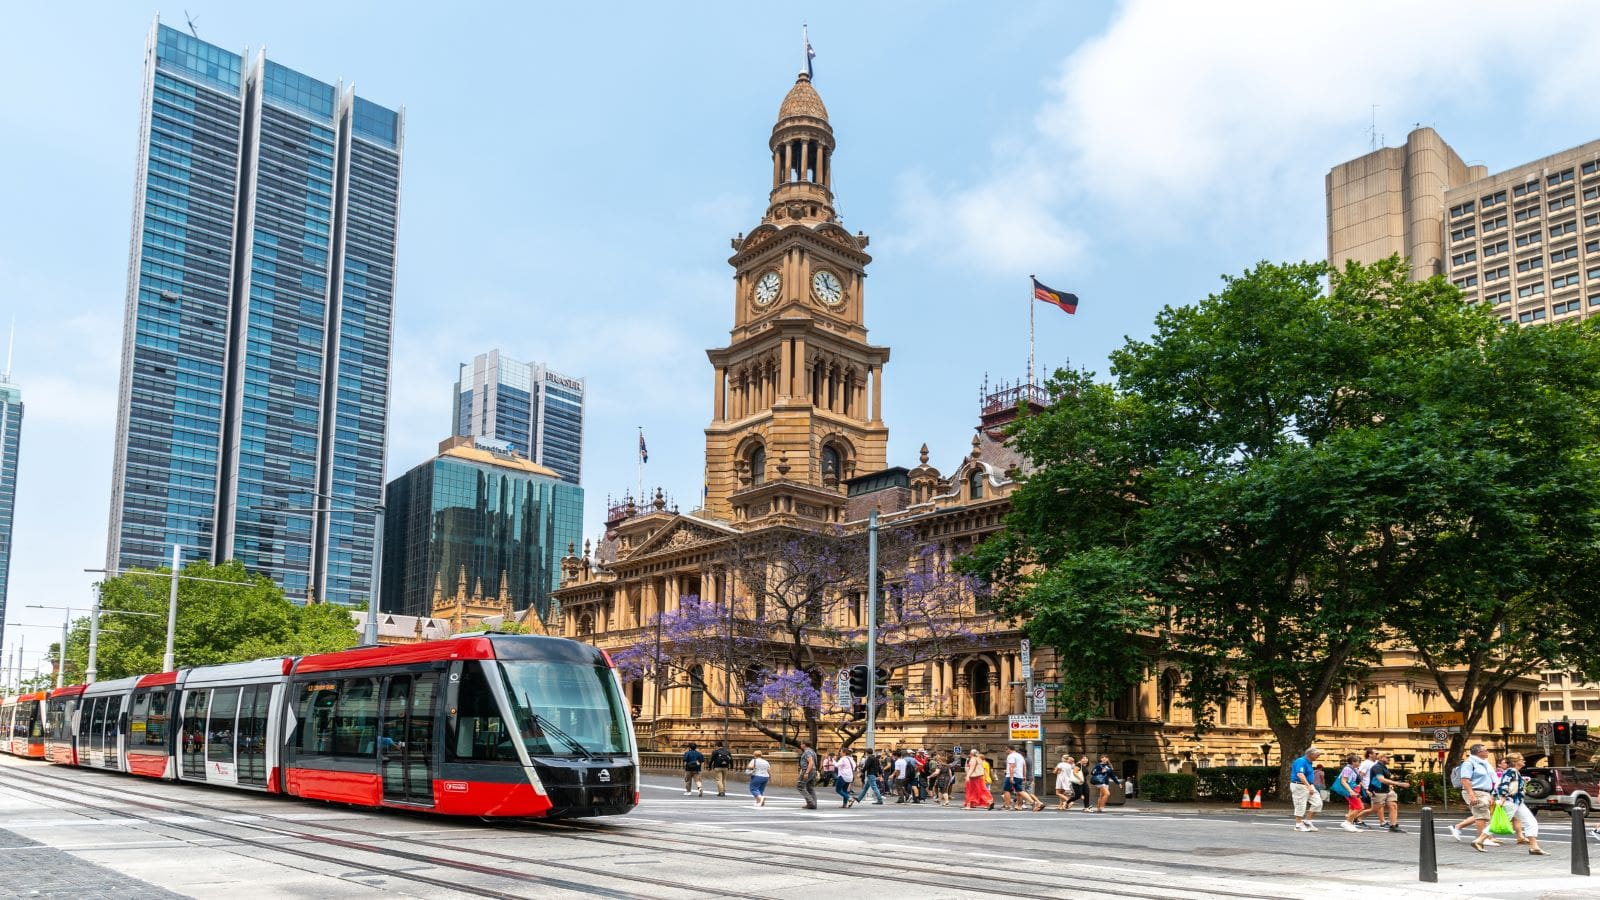 Sydney, Australia November 22, 2019: New Light Rail Tram travels along George Street to Circular Quay, Sydney CBD, New South Wales, Australia.